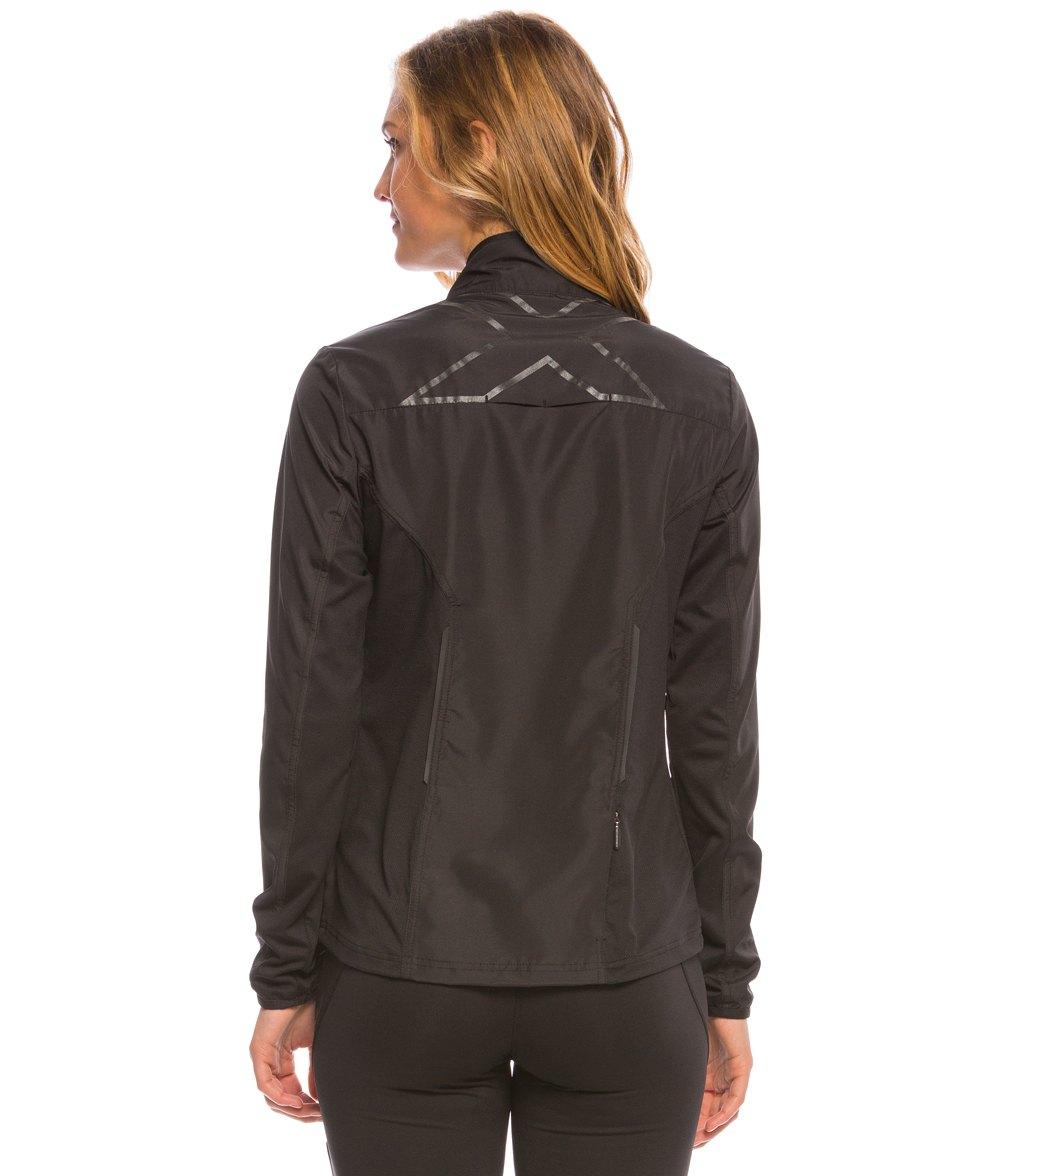 830ee8cc 2XU Women's Hyoptik Jacket at SwimOutlet.com - Free Shipping